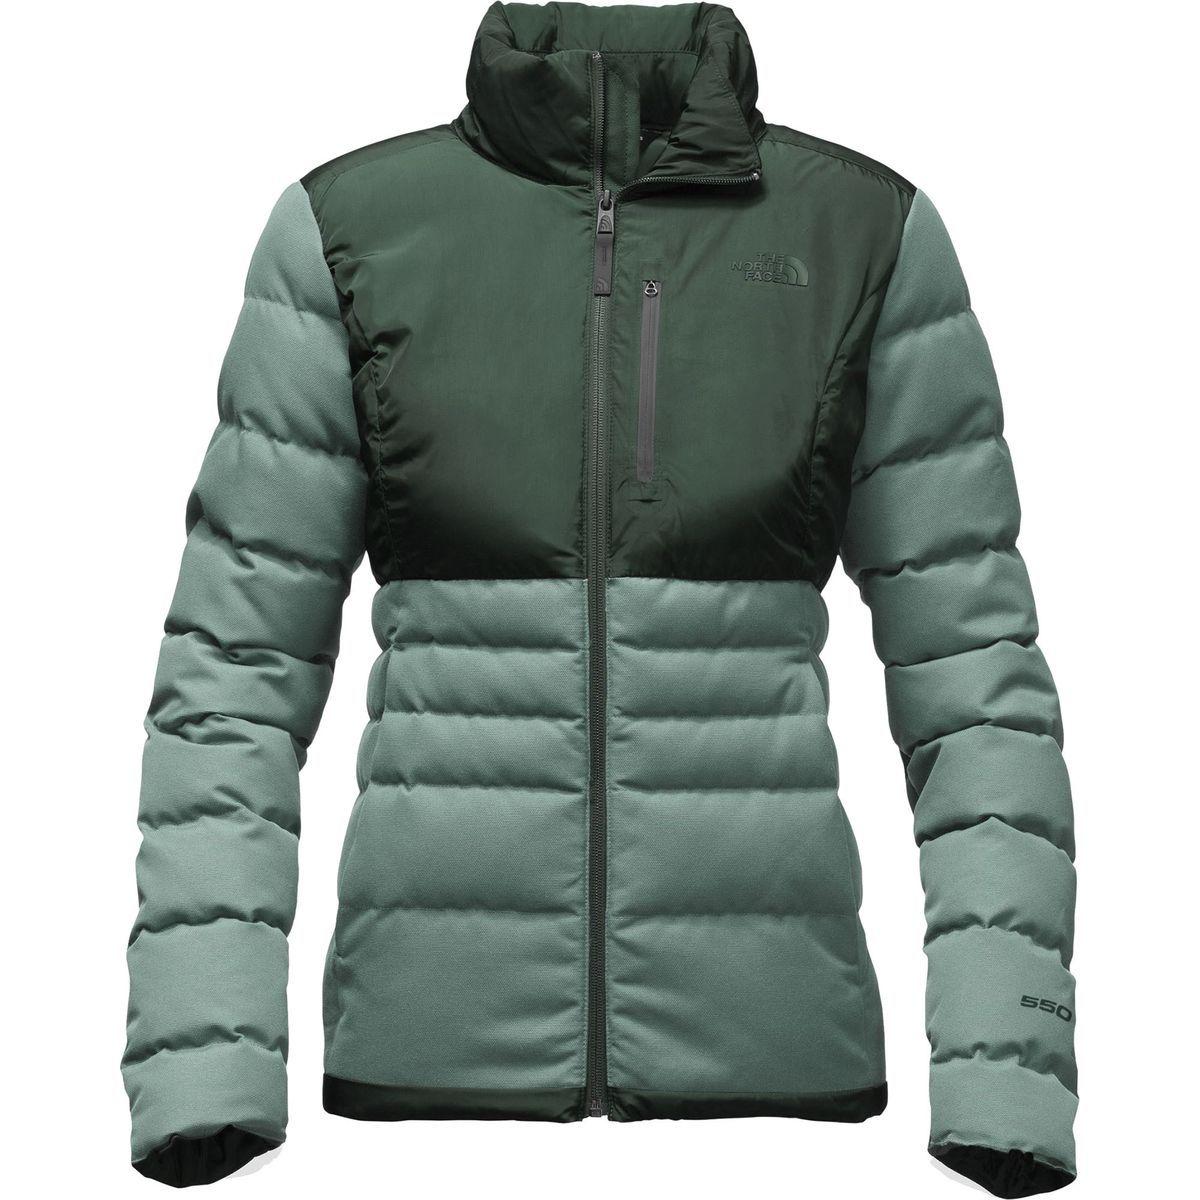 The North Face Denali Down Jacket Darkest Spruce S